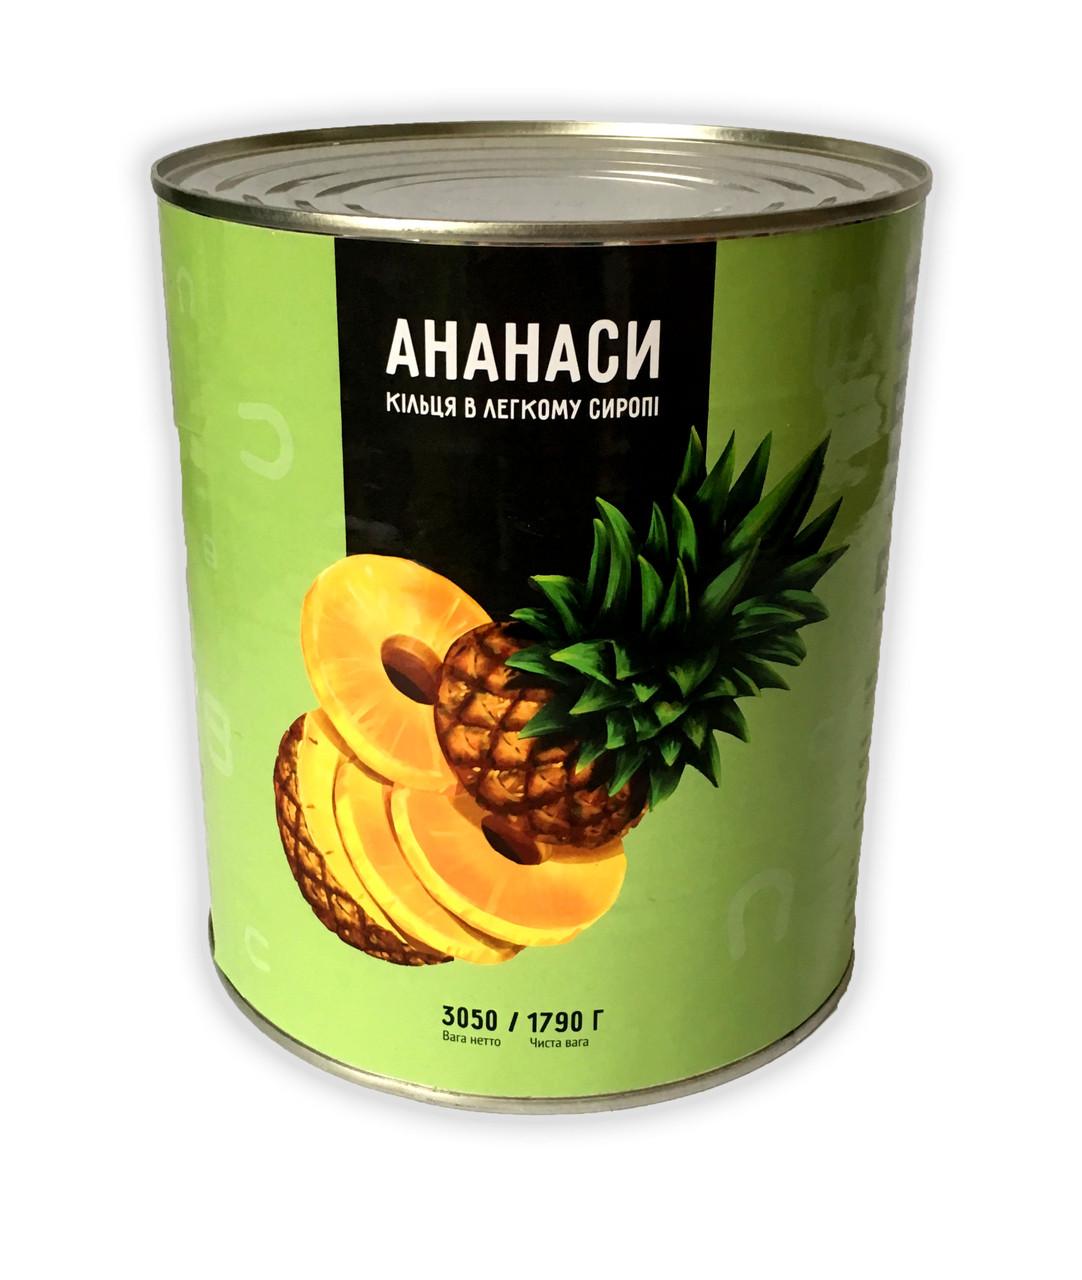 Ананасы кольцами 3.1 кг